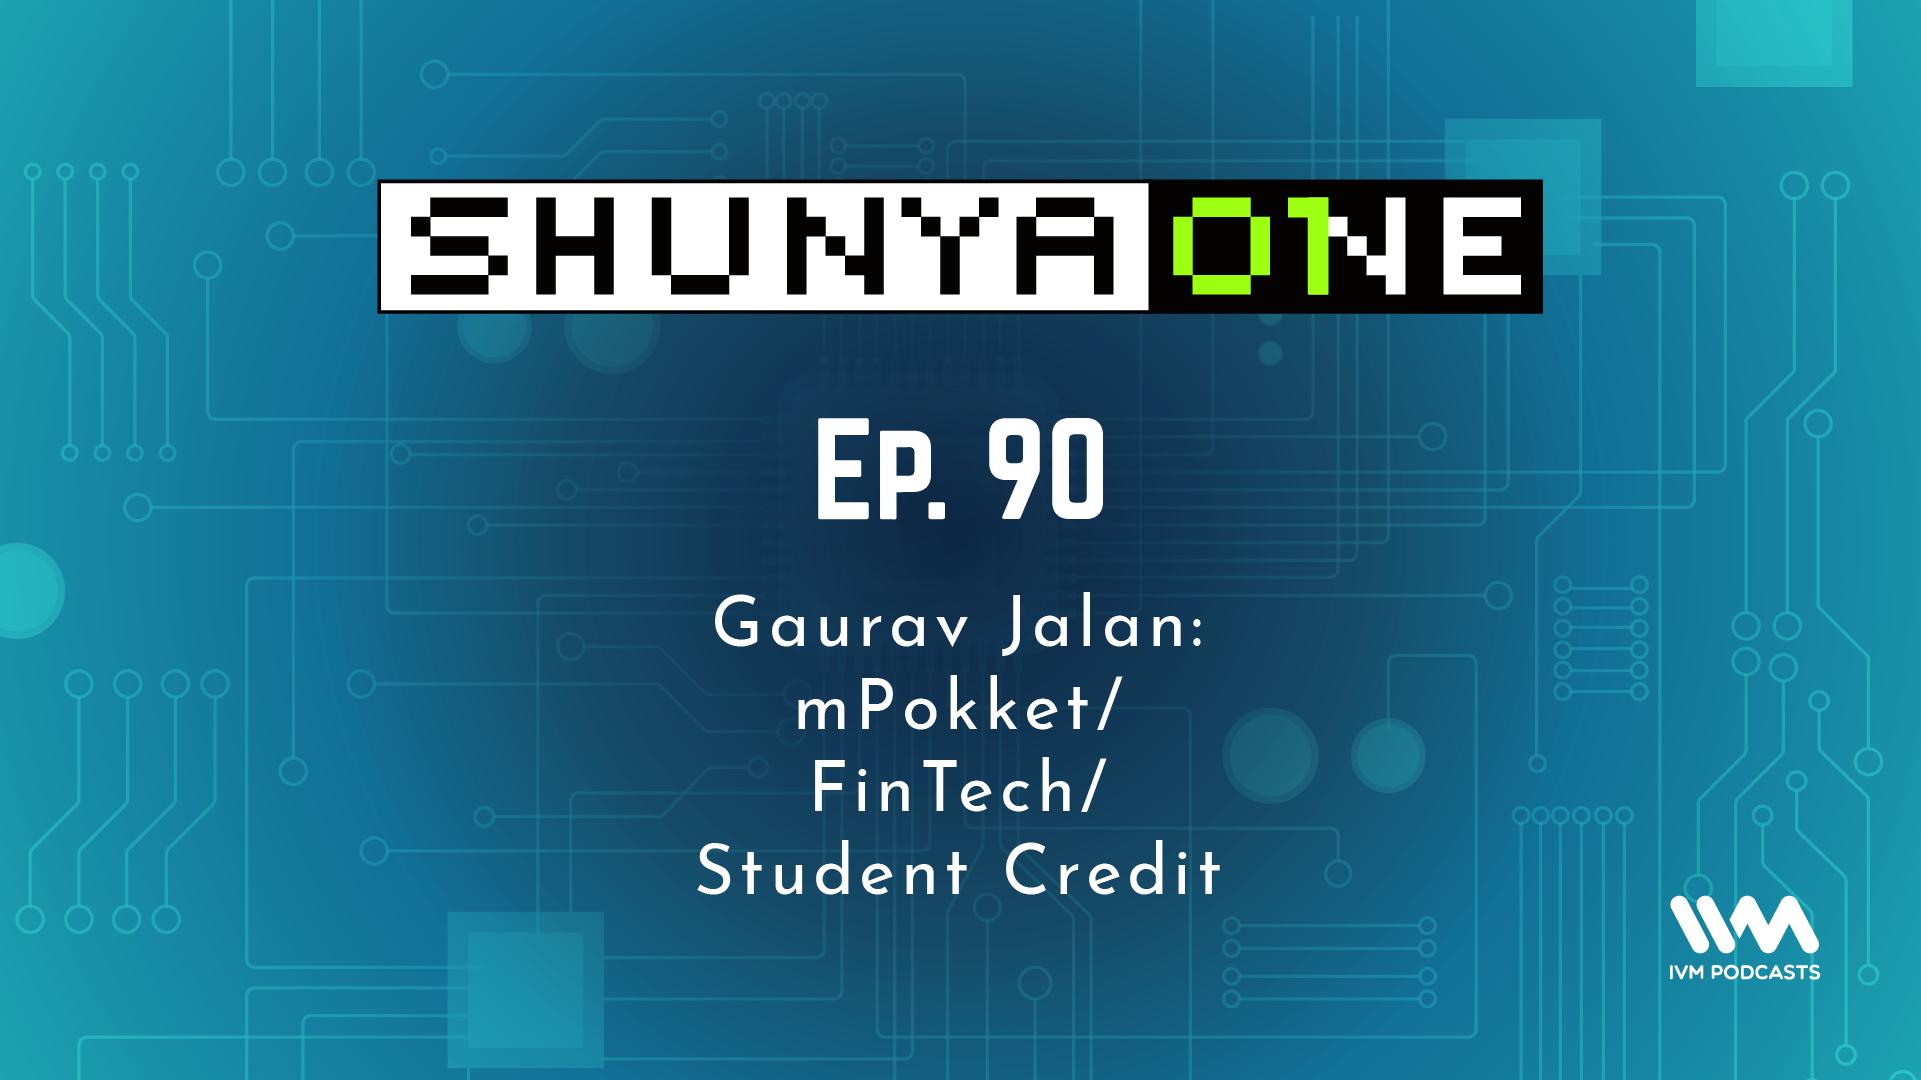 ShunyaOneEpisode90.png